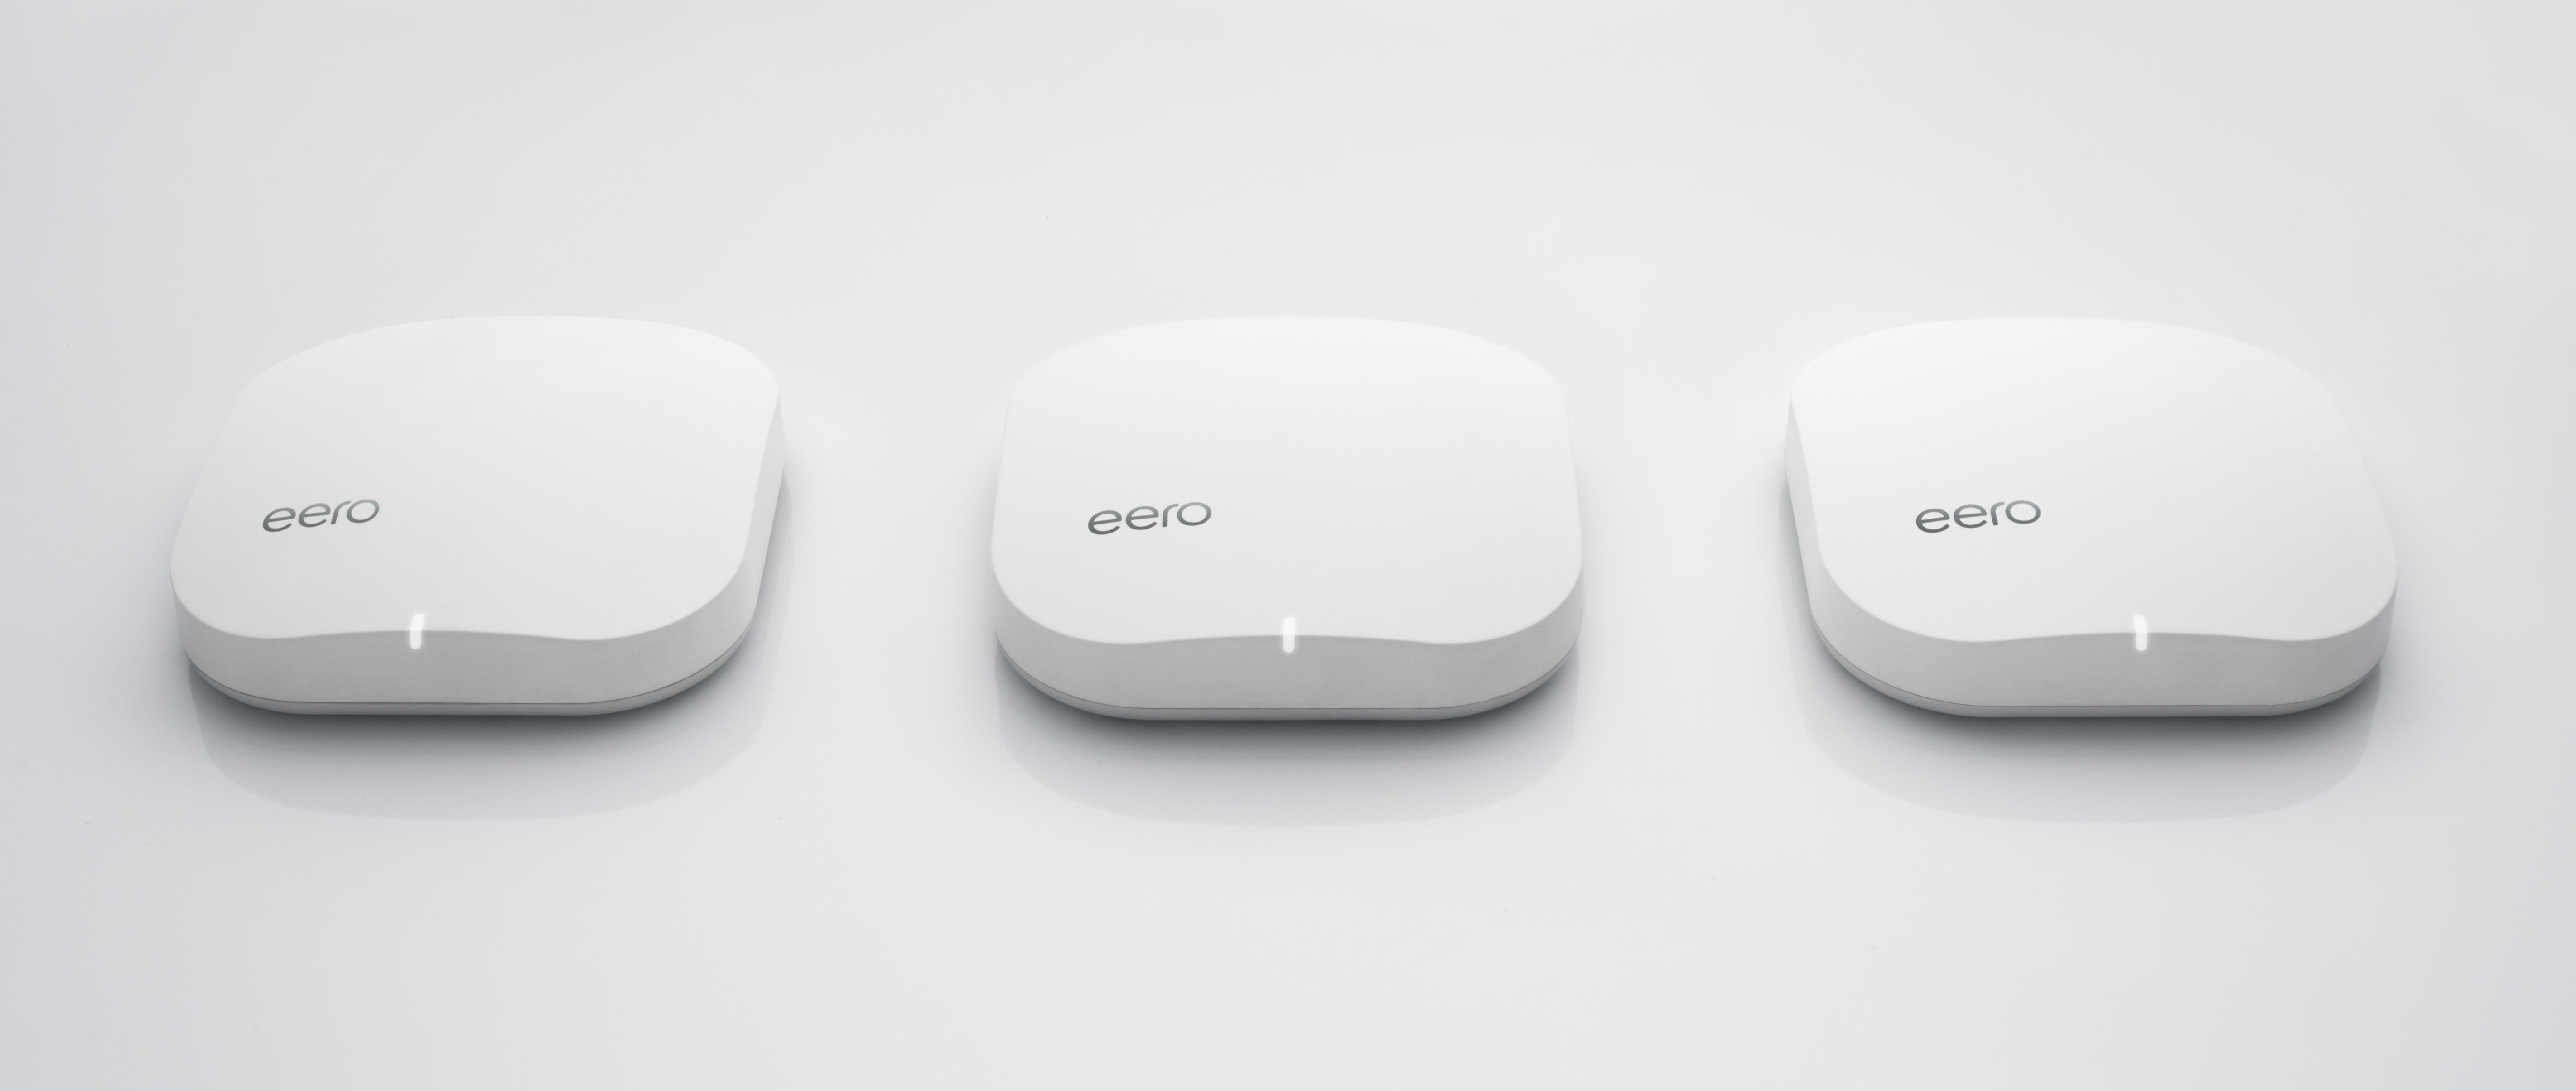 Eero Takes A Crack At Pushing Mesh Wi Fi Through Your